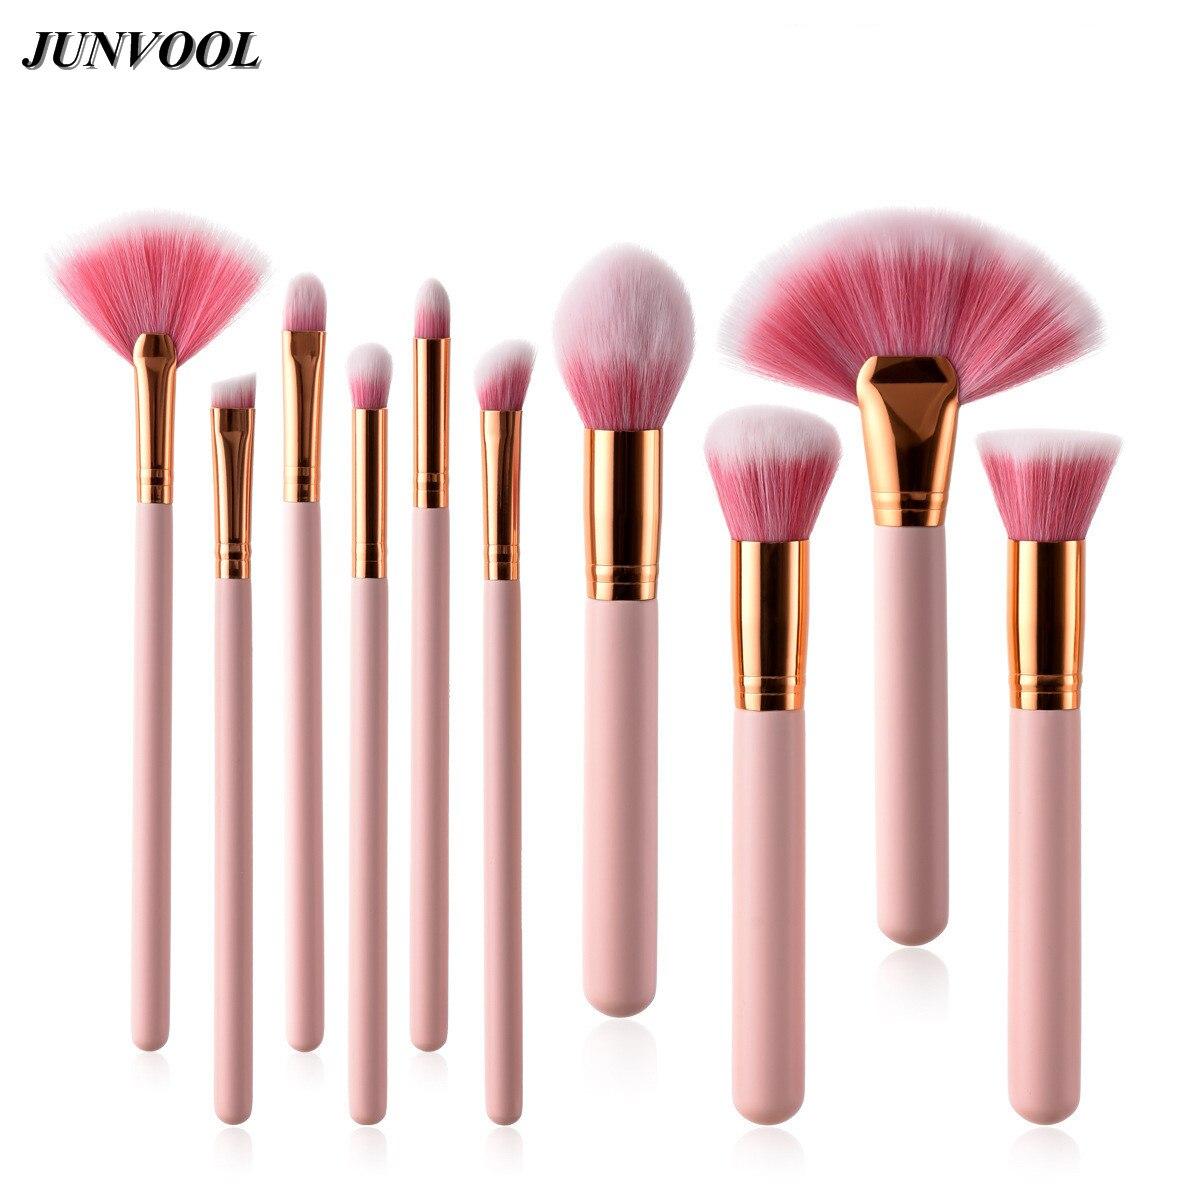 10pcs Pink Makeup Cosmetic Brushes Face Nose BB Cream Powder Liquid Eye Shadow Foundation Tools Make Up Base Large Fan Brush цена и фото